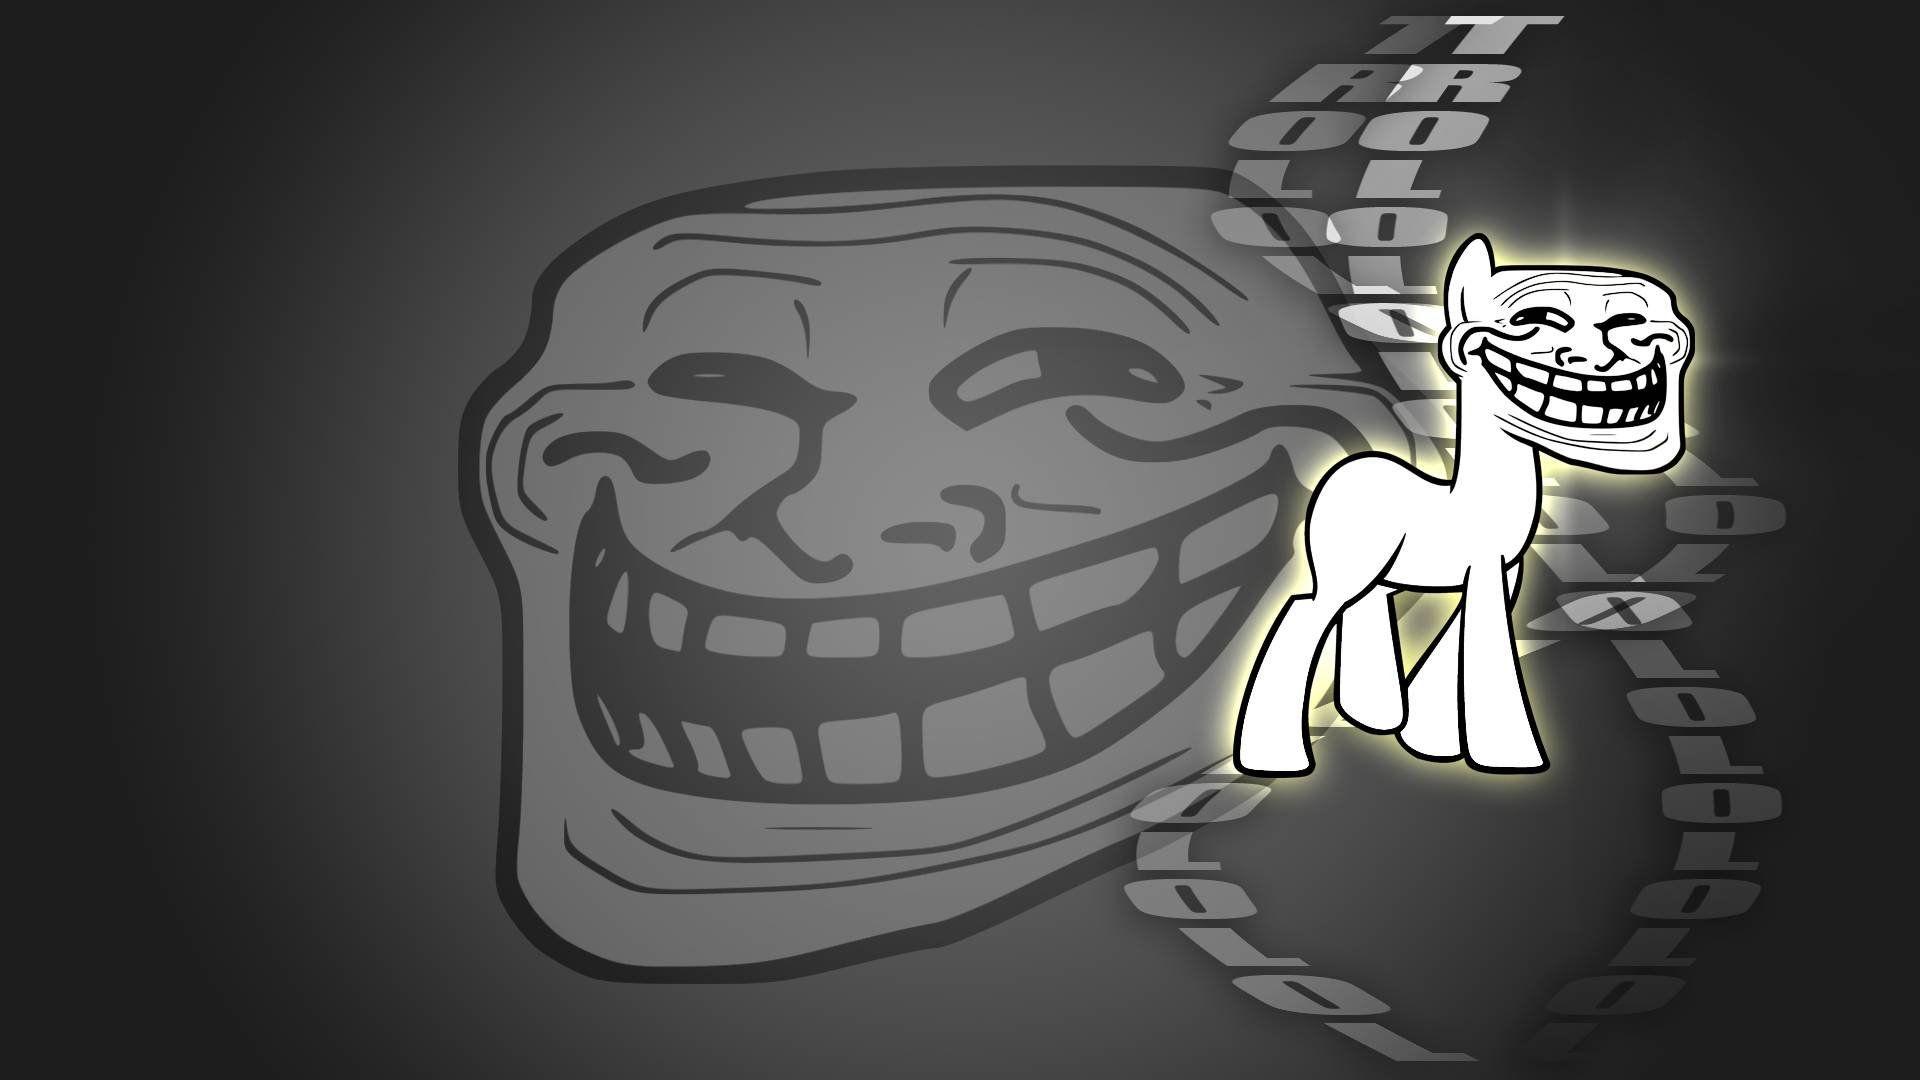 troll face hd wallpapers backgrounds wallpaper